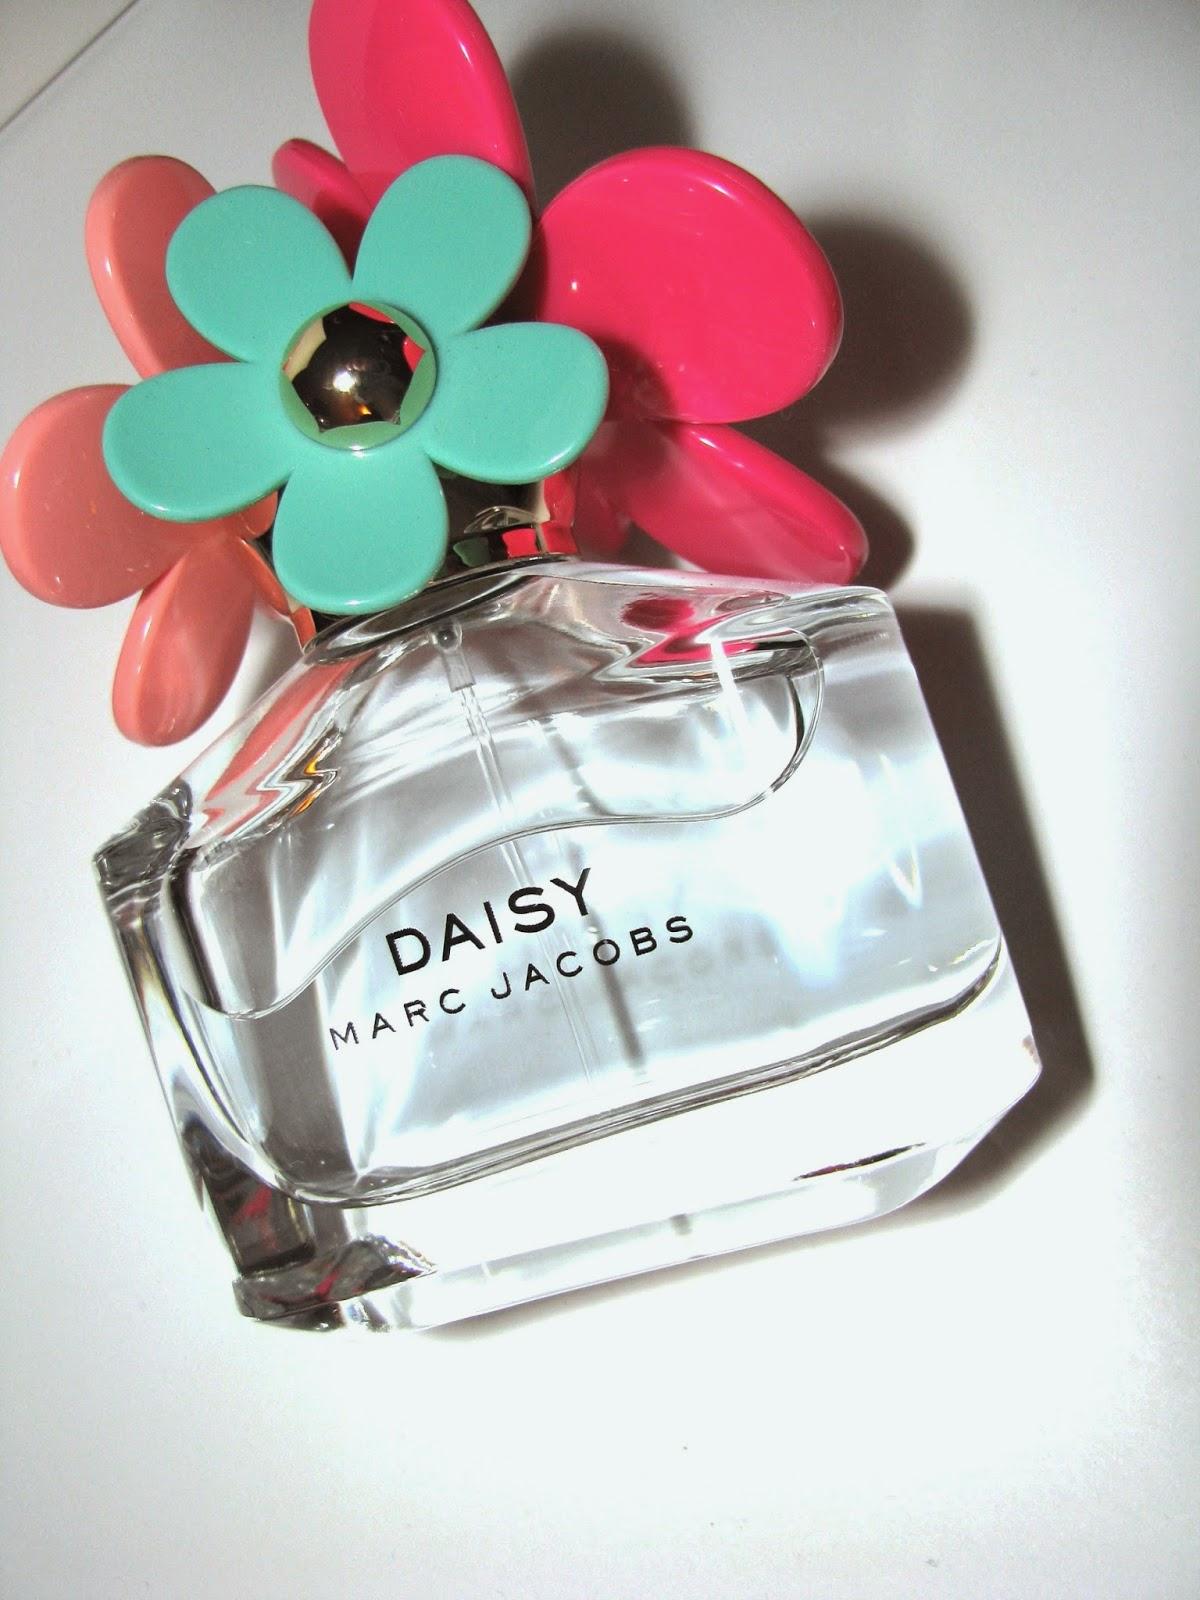 The beauty alchemist marc jacobs daisy delight marc jacobs daisy delight izmirmasajfo Image collections